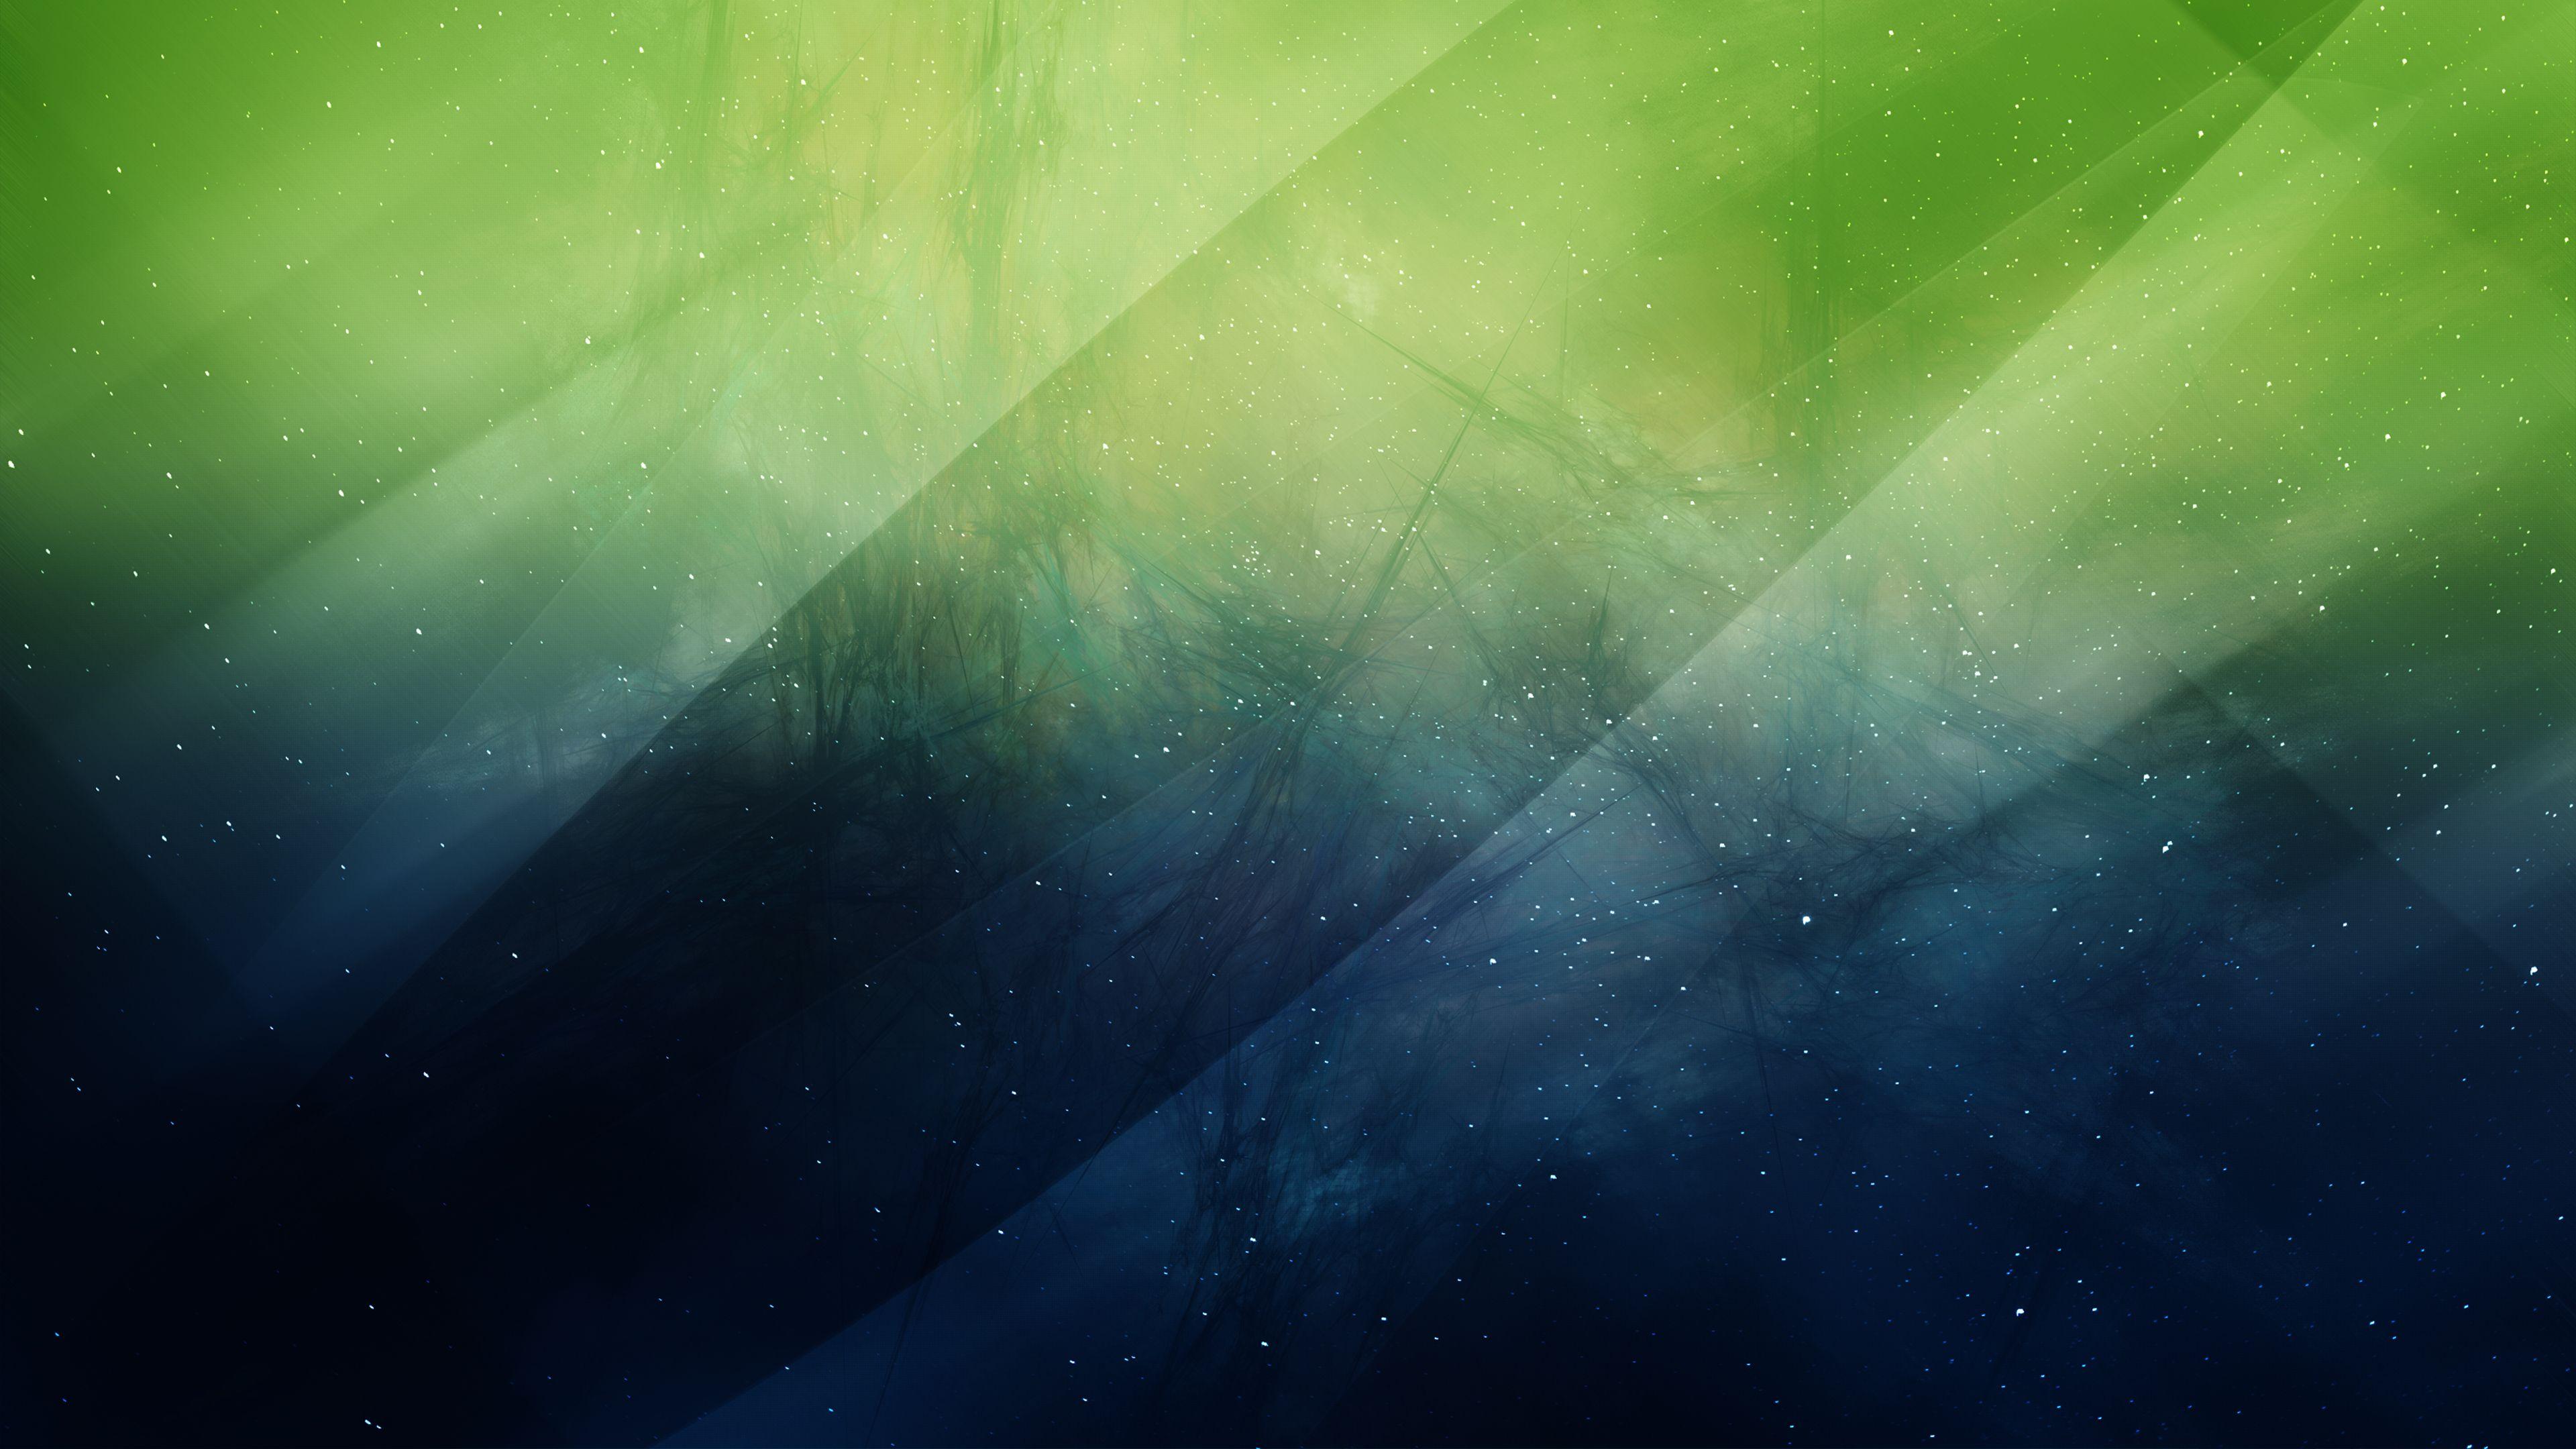 Green Sky Nature Abstract Green Sky Abstract Widescreen Wallpaper